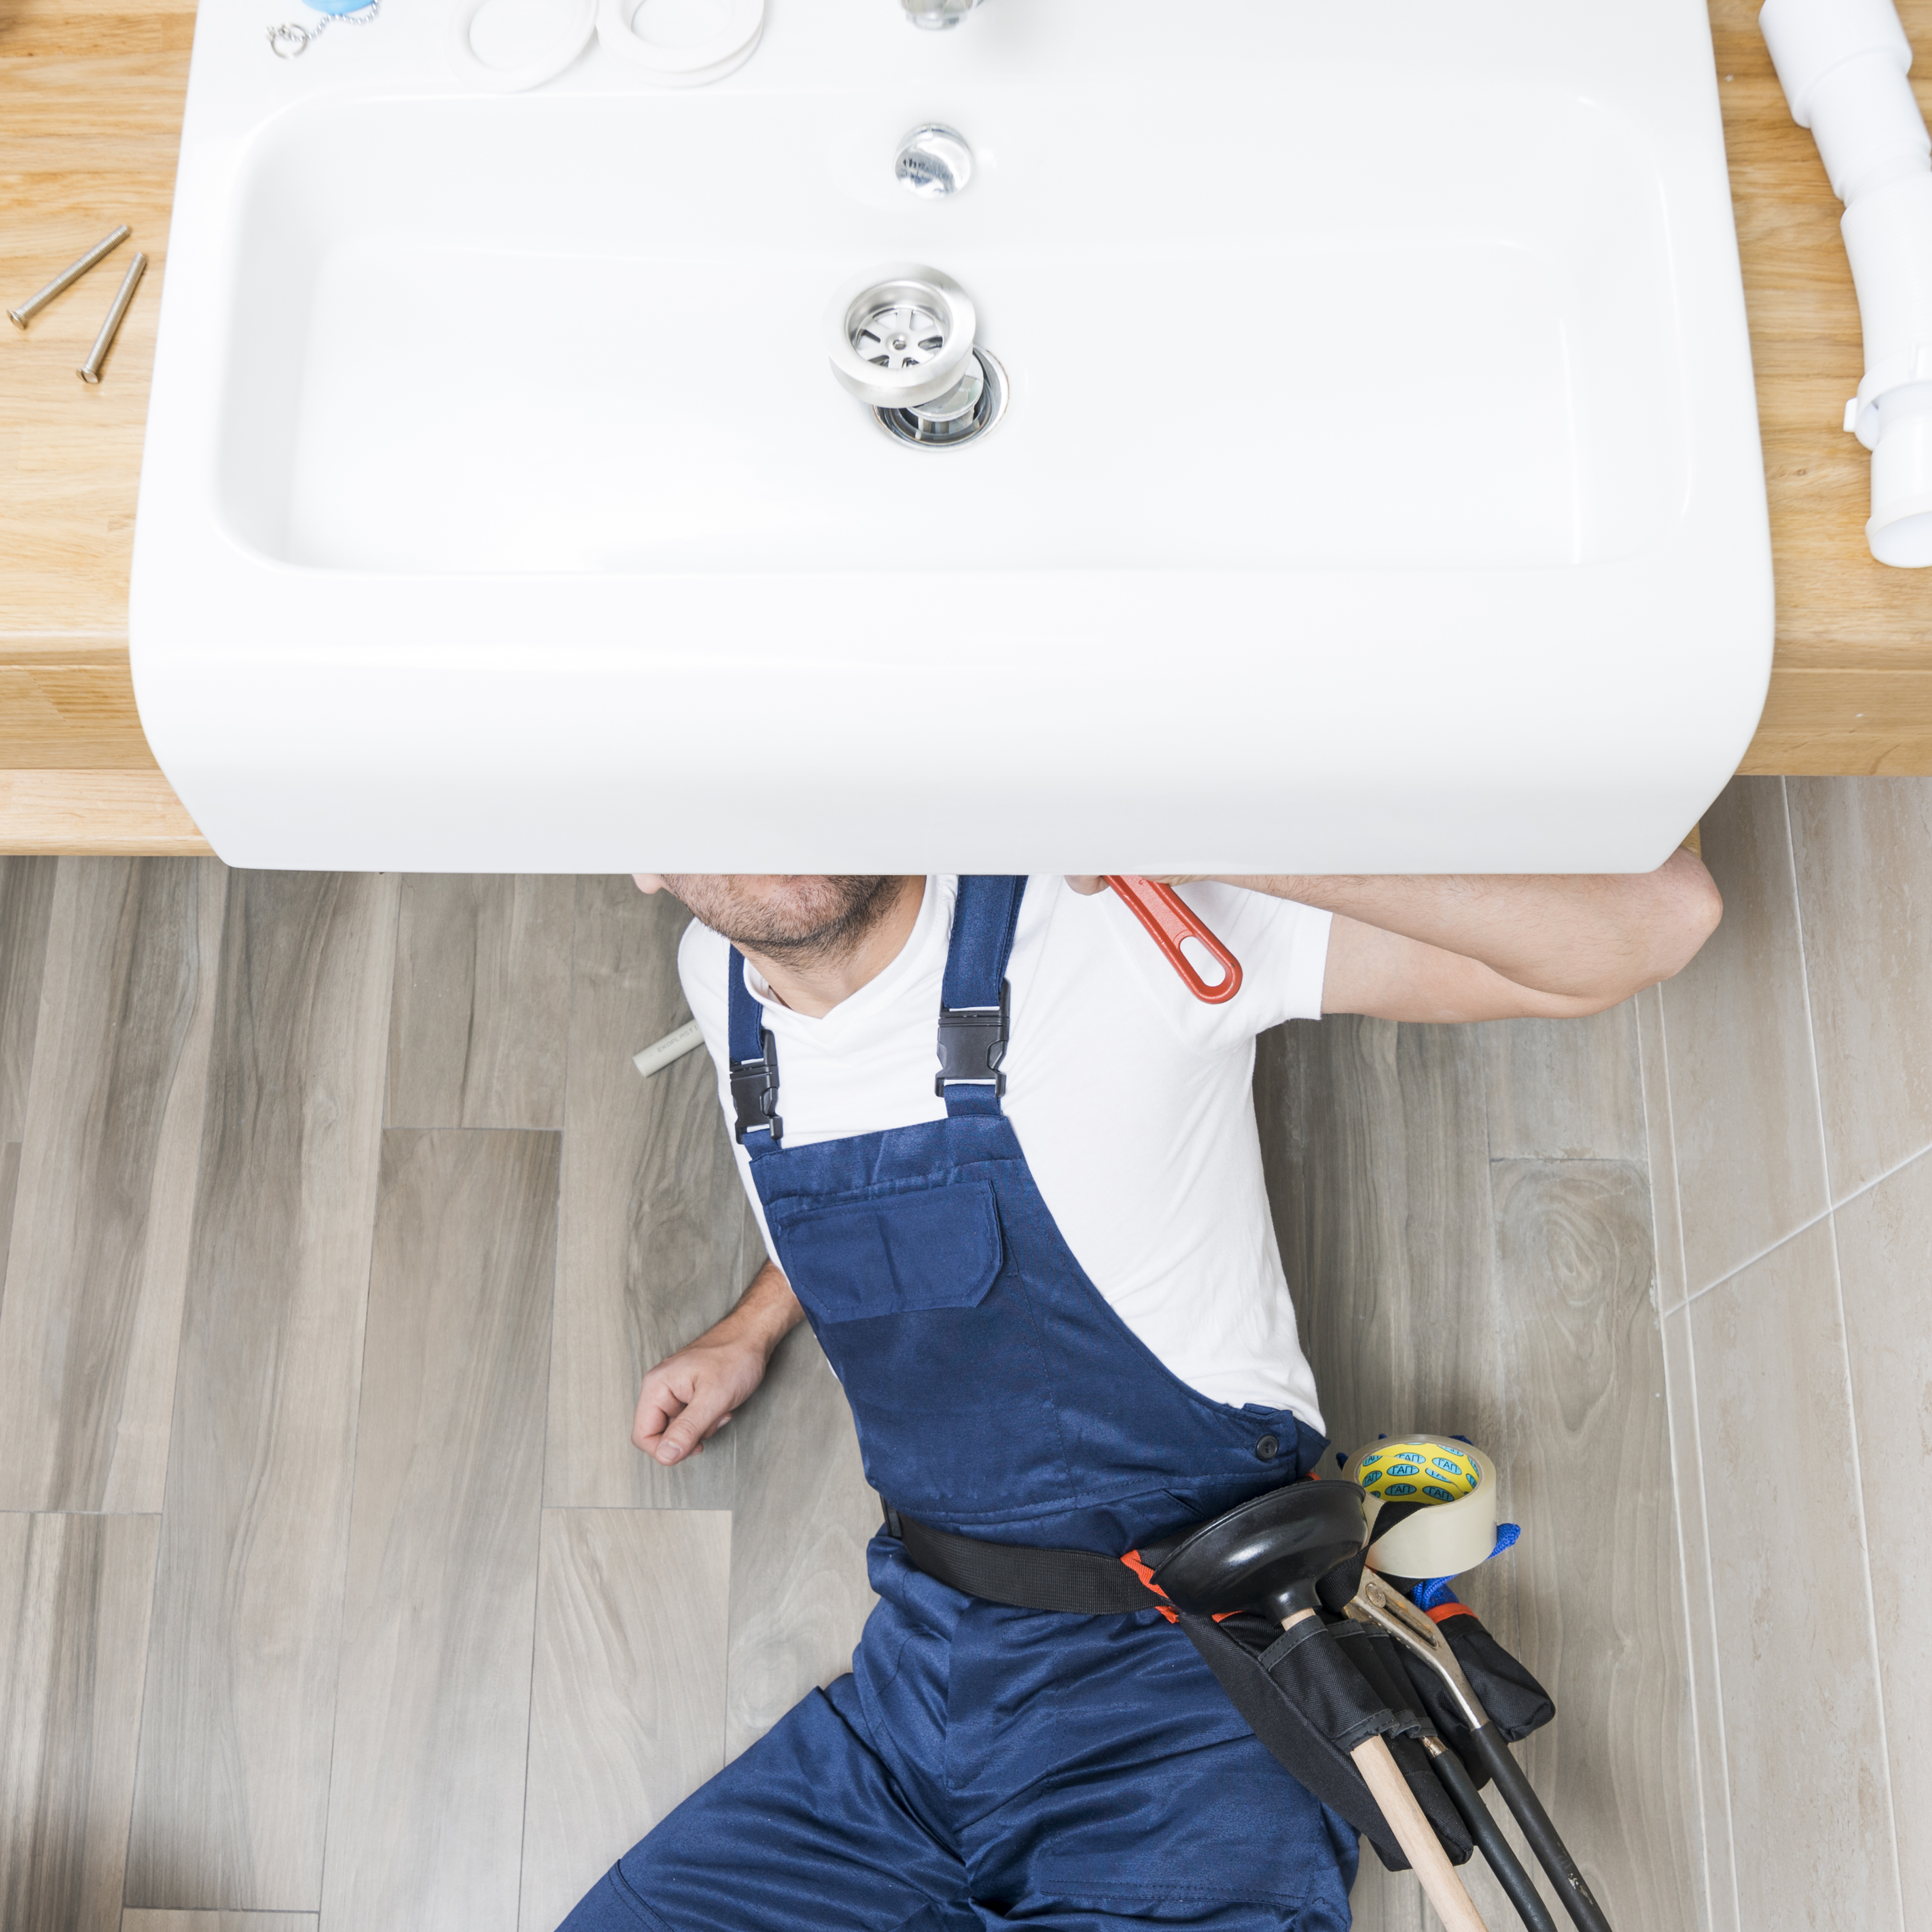 24 hour plumbing service singapore